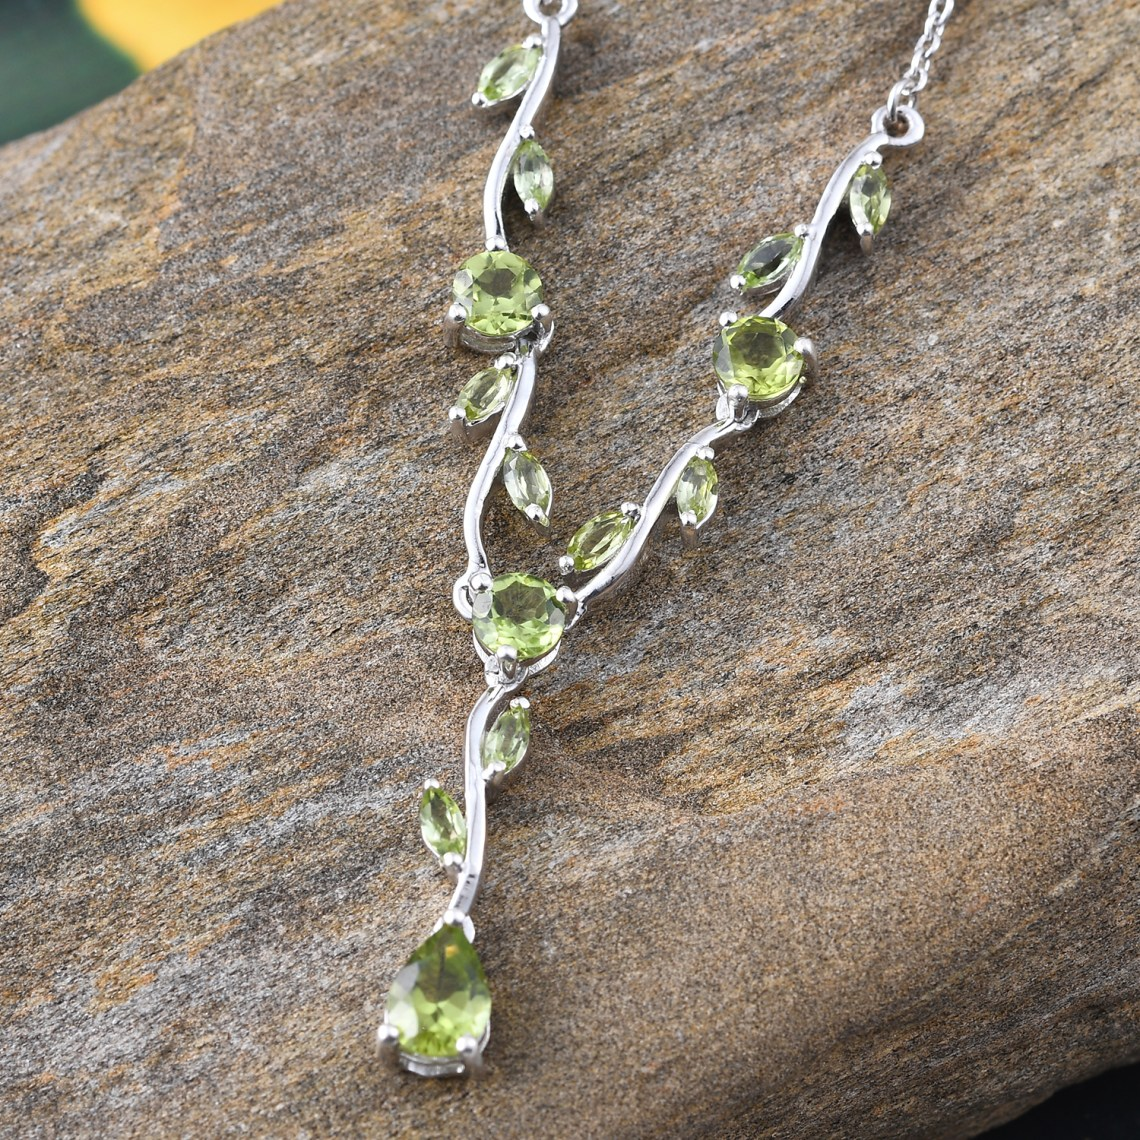 Peridot necklace carefully draped over stone.